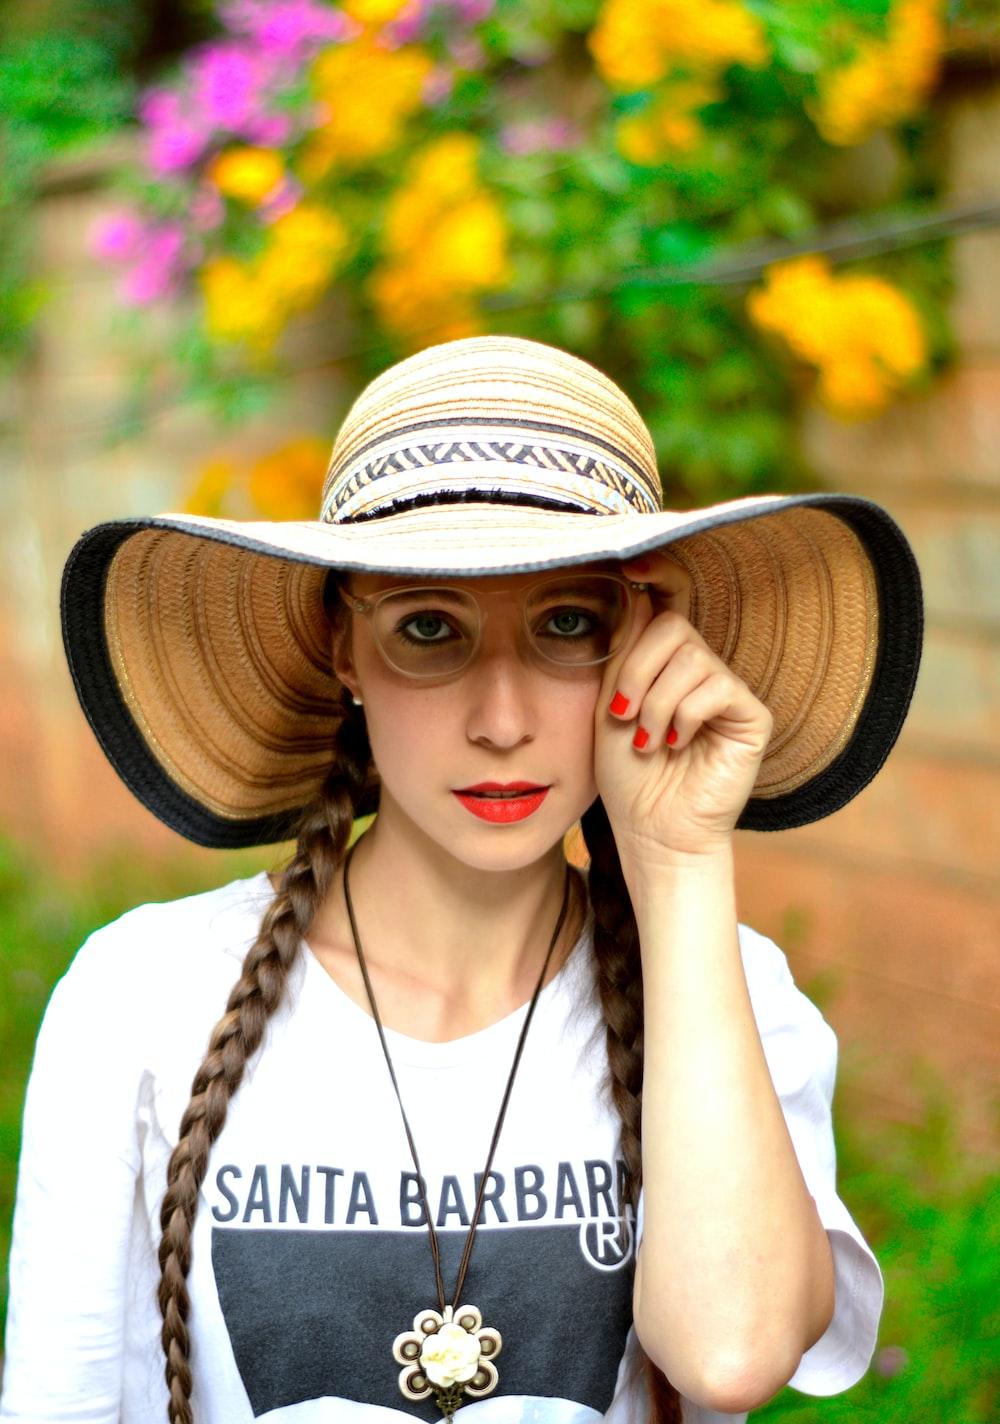 woman in white shirt wearing brown straw hat